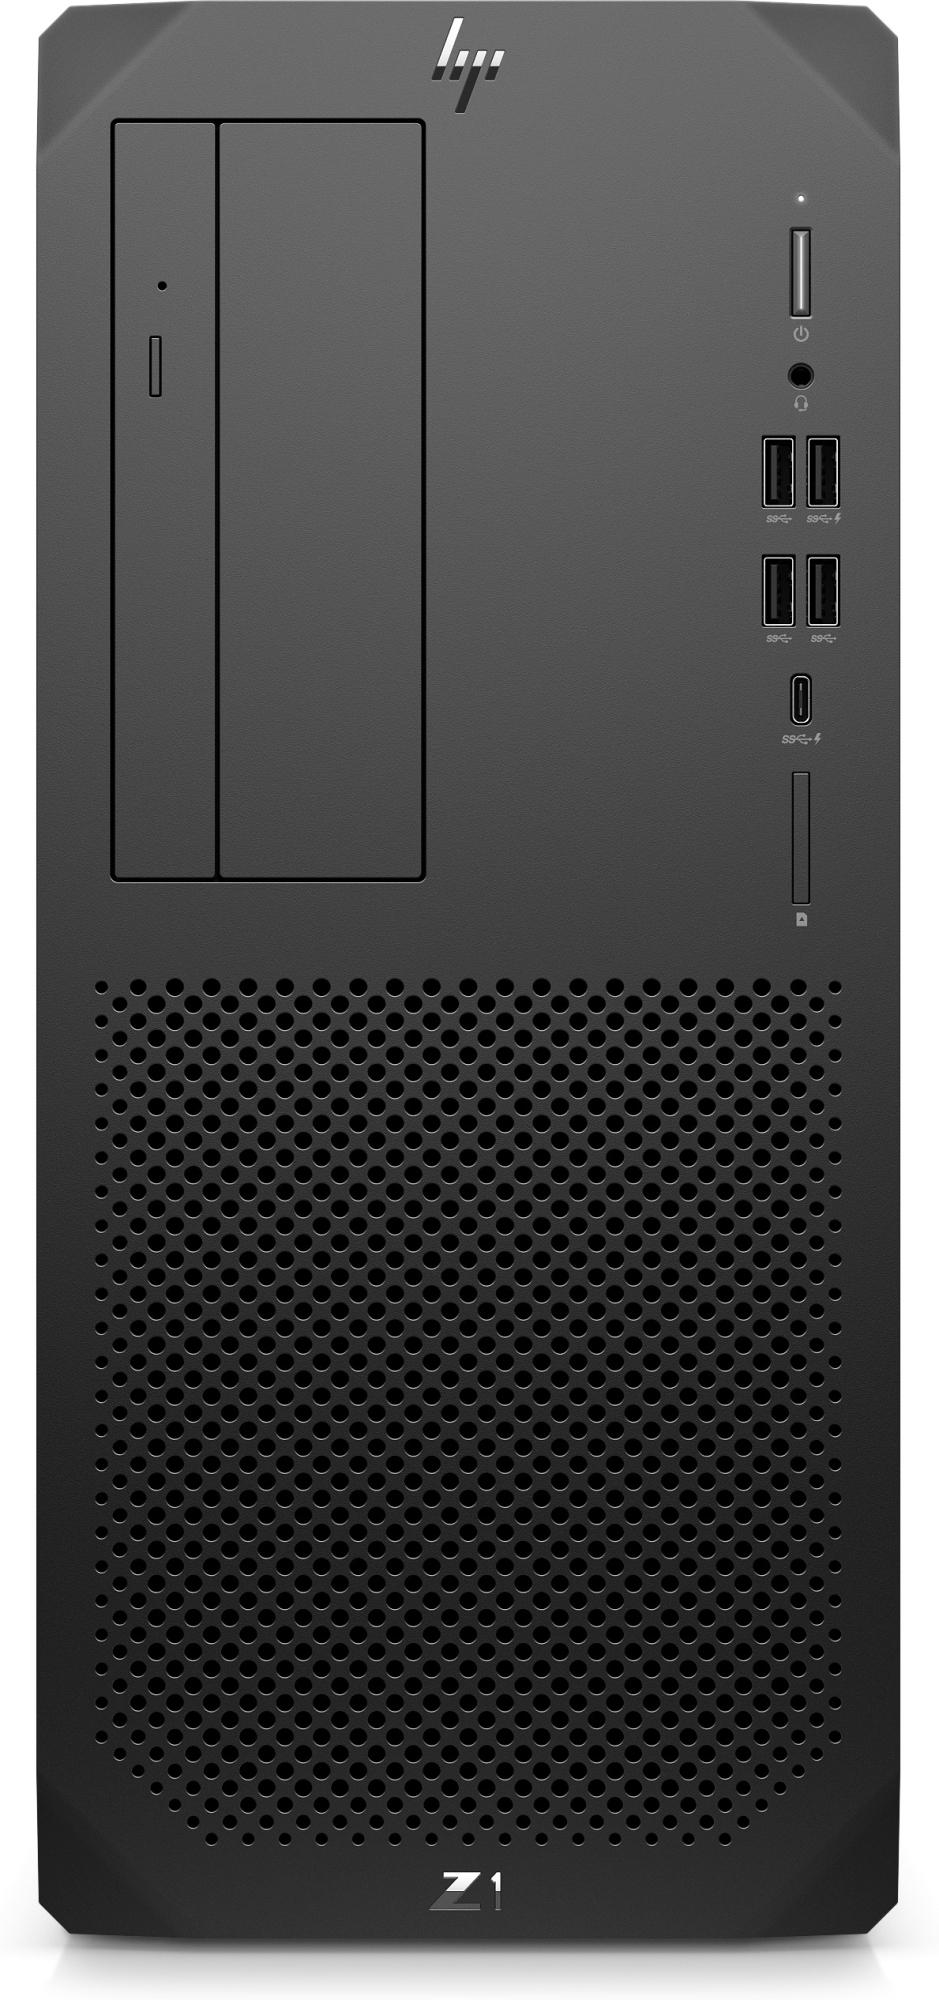 Z1 G8 Ddr4-sdram I7-11700 Torre Intel® Core™ I7 De 11ma Generación 16 Gb 512 Gb Ssd Windows 10 Pro Pc Negro